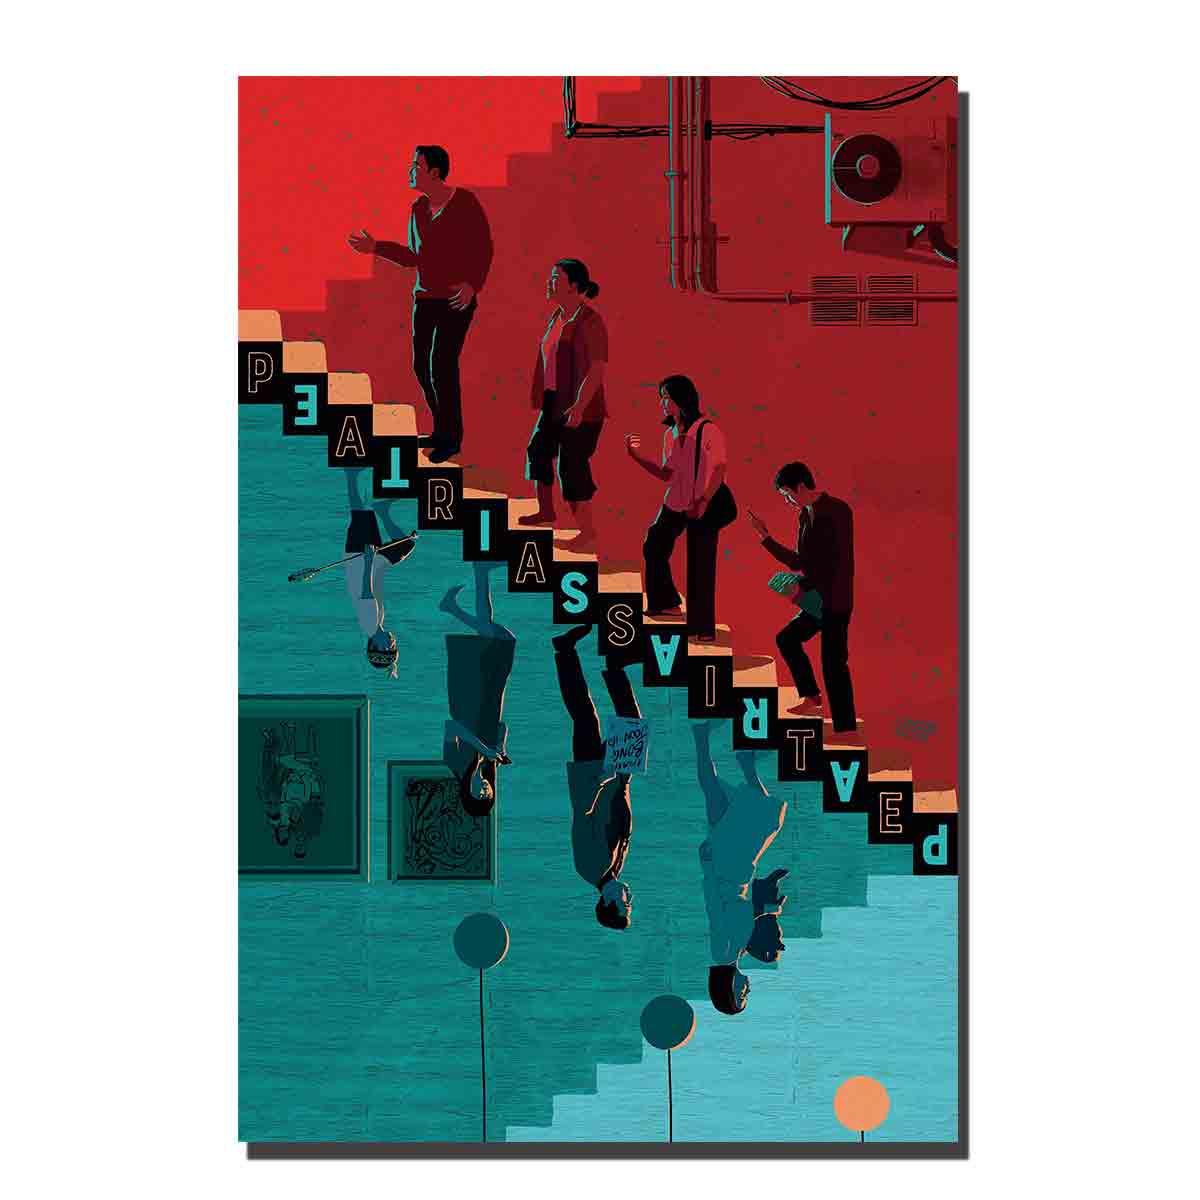 C513, pósteres de película para parásitos e impresiones artísticos, cuadros de pared para sala de estar 12x18 27x40 8x12, pintura en lienzo